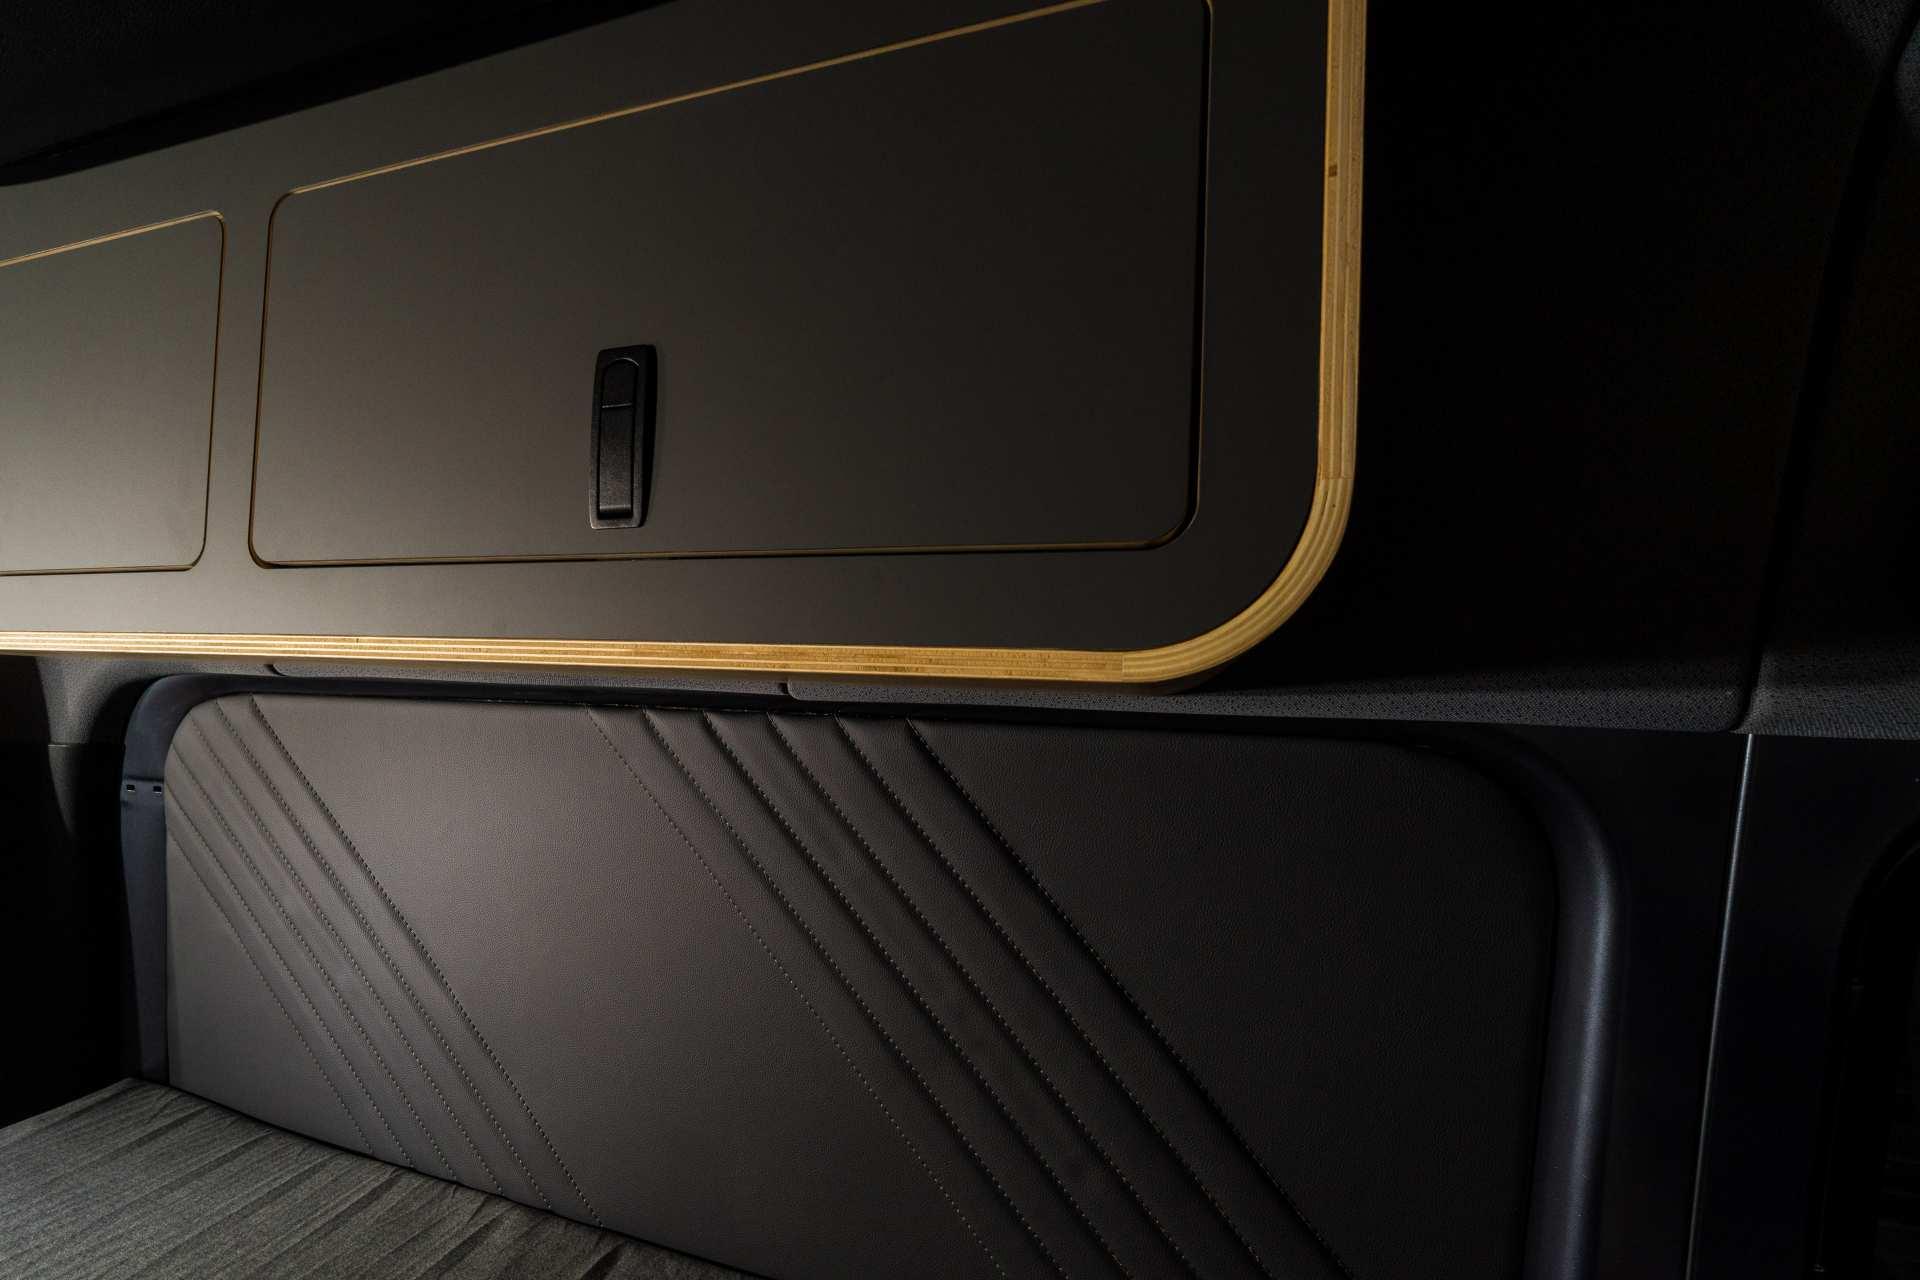 Individualausbau: Mercedes L2 H2 Mixto - 14